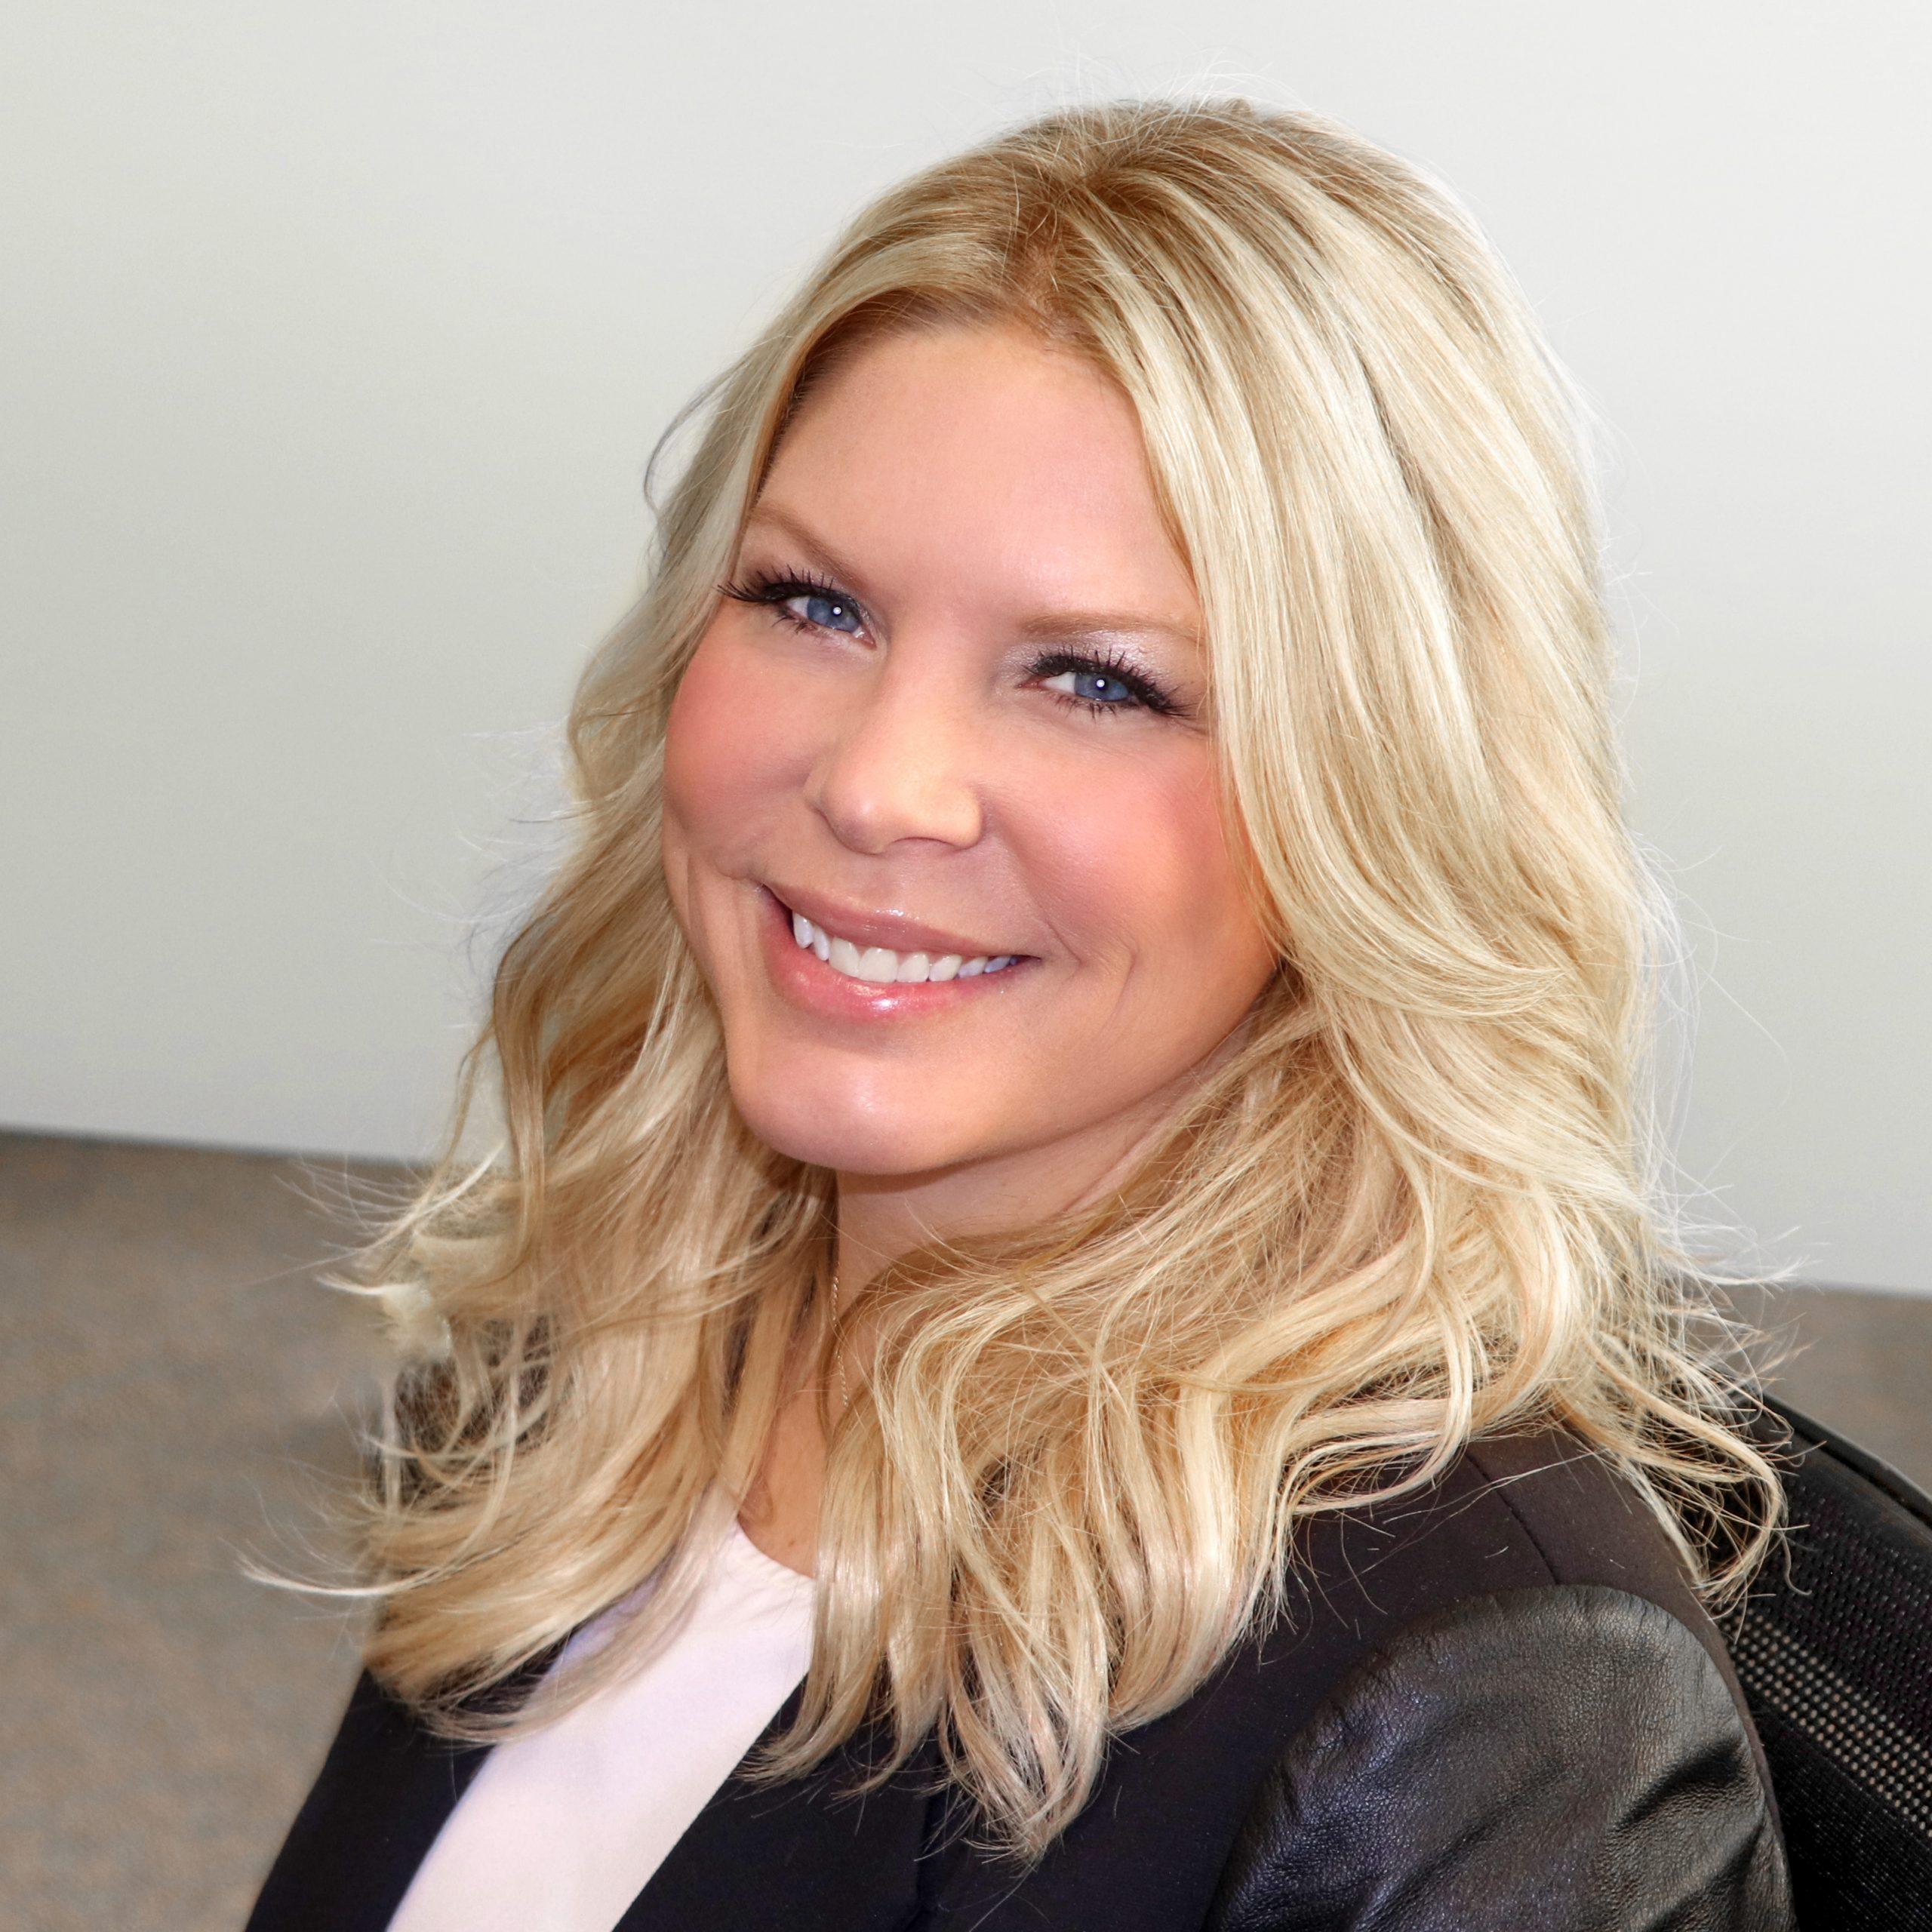 Amy Kapler